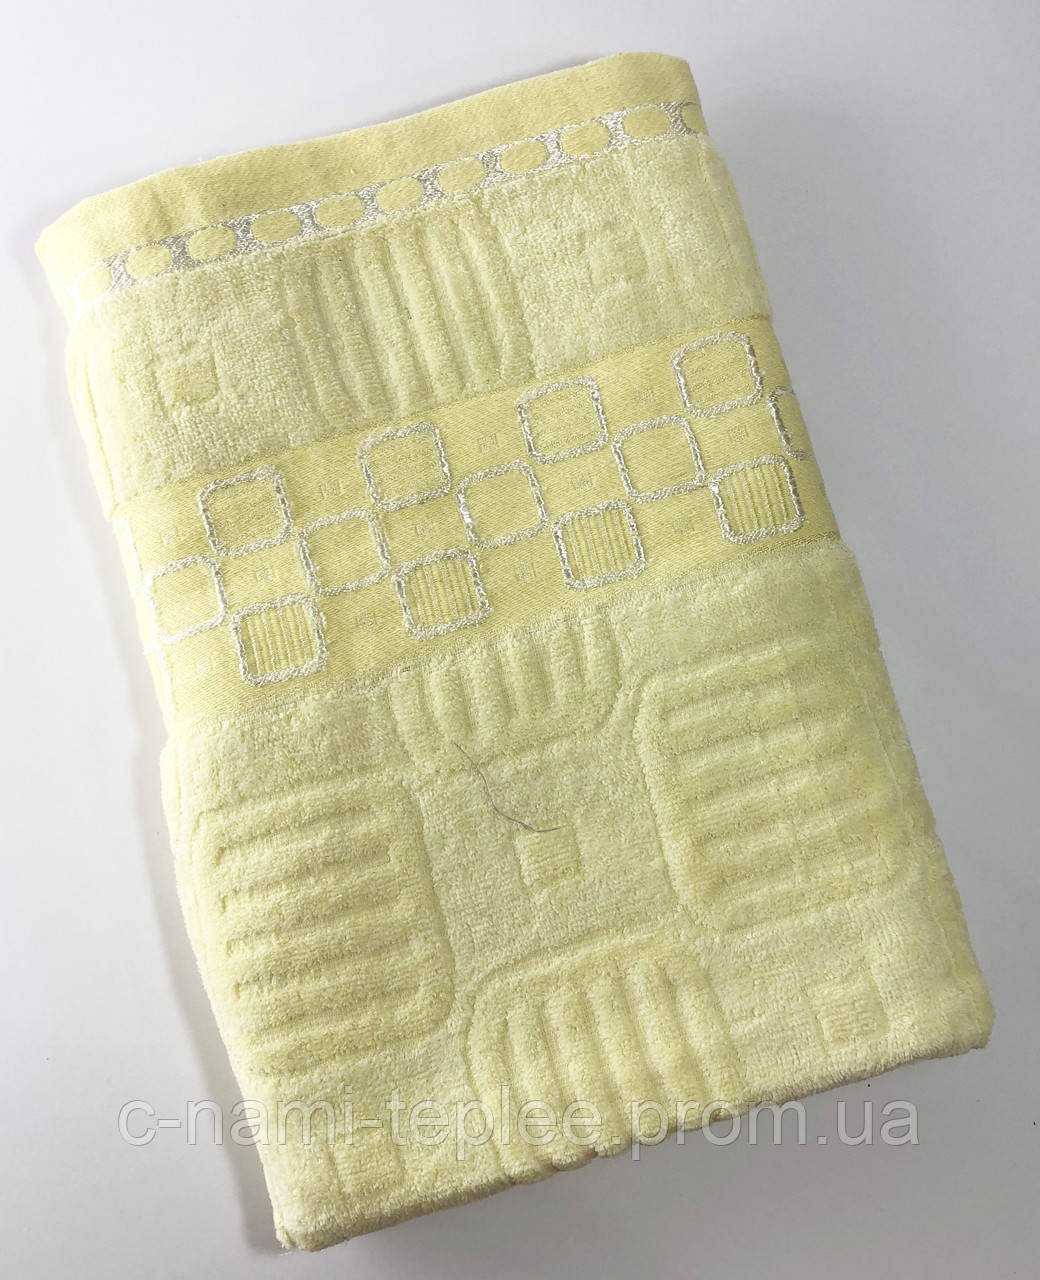 Полотенце банное 70х140 Лимонный